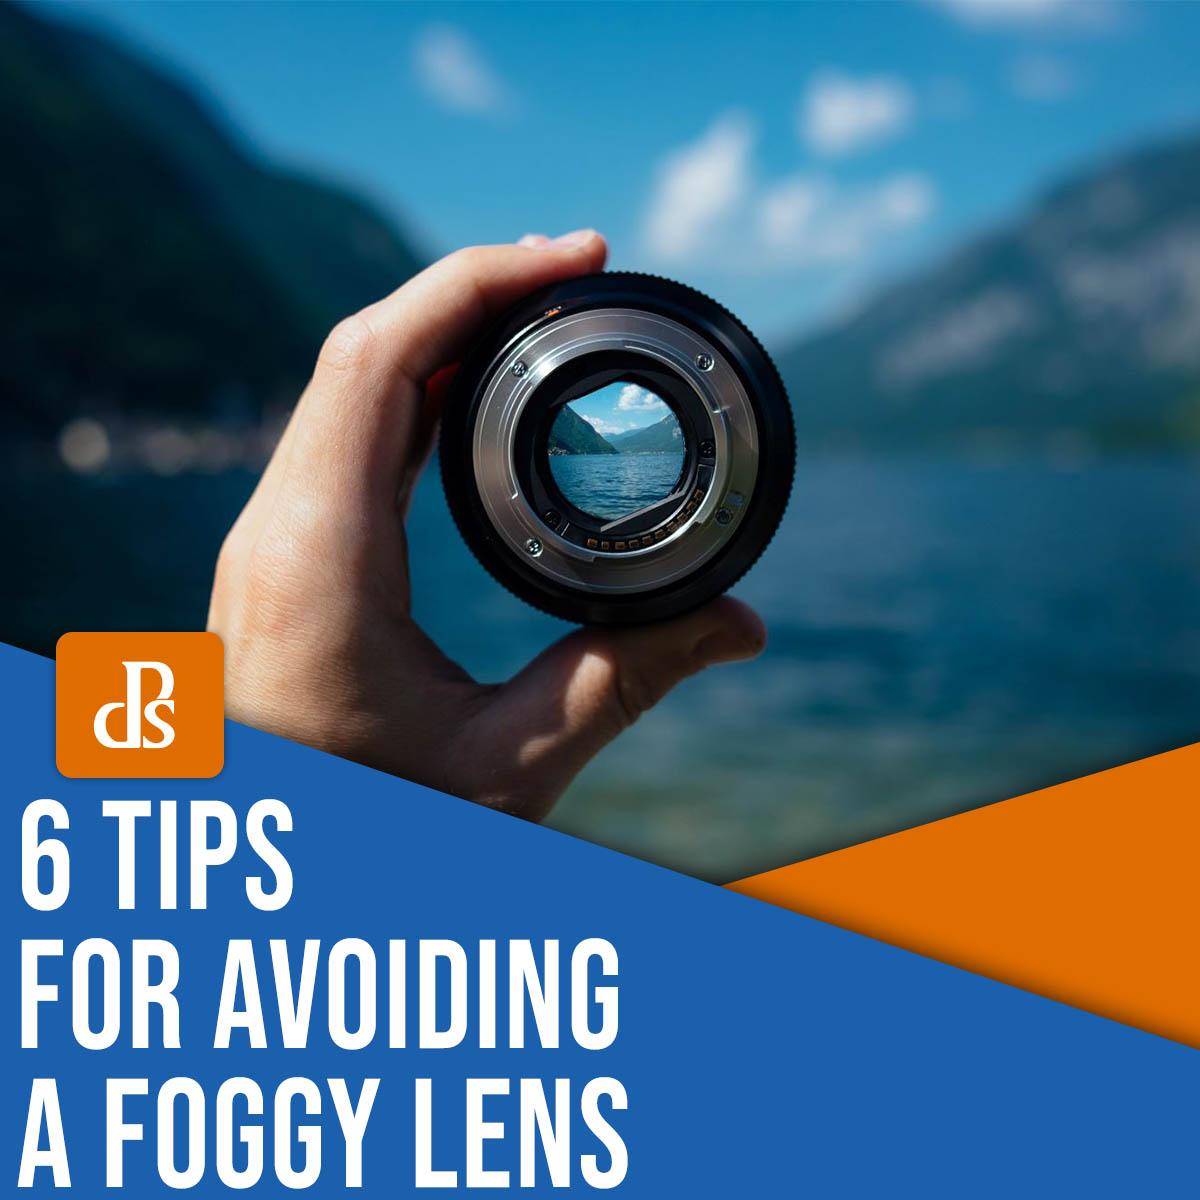 6 tips for avoiding a foggy lens